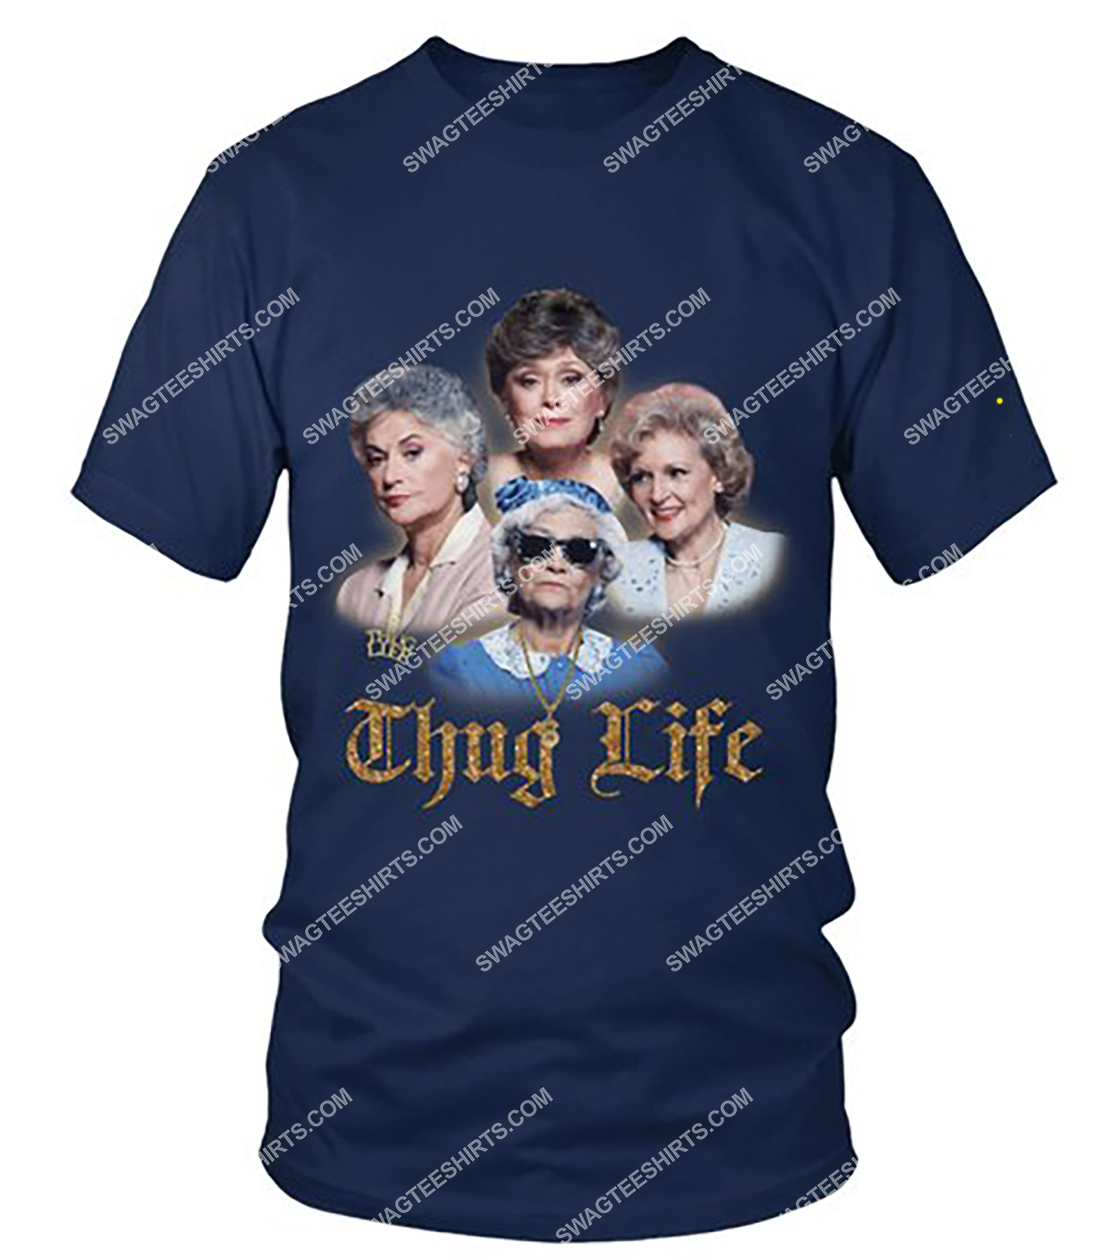 thug life the golden girls movie shirt 3(1)